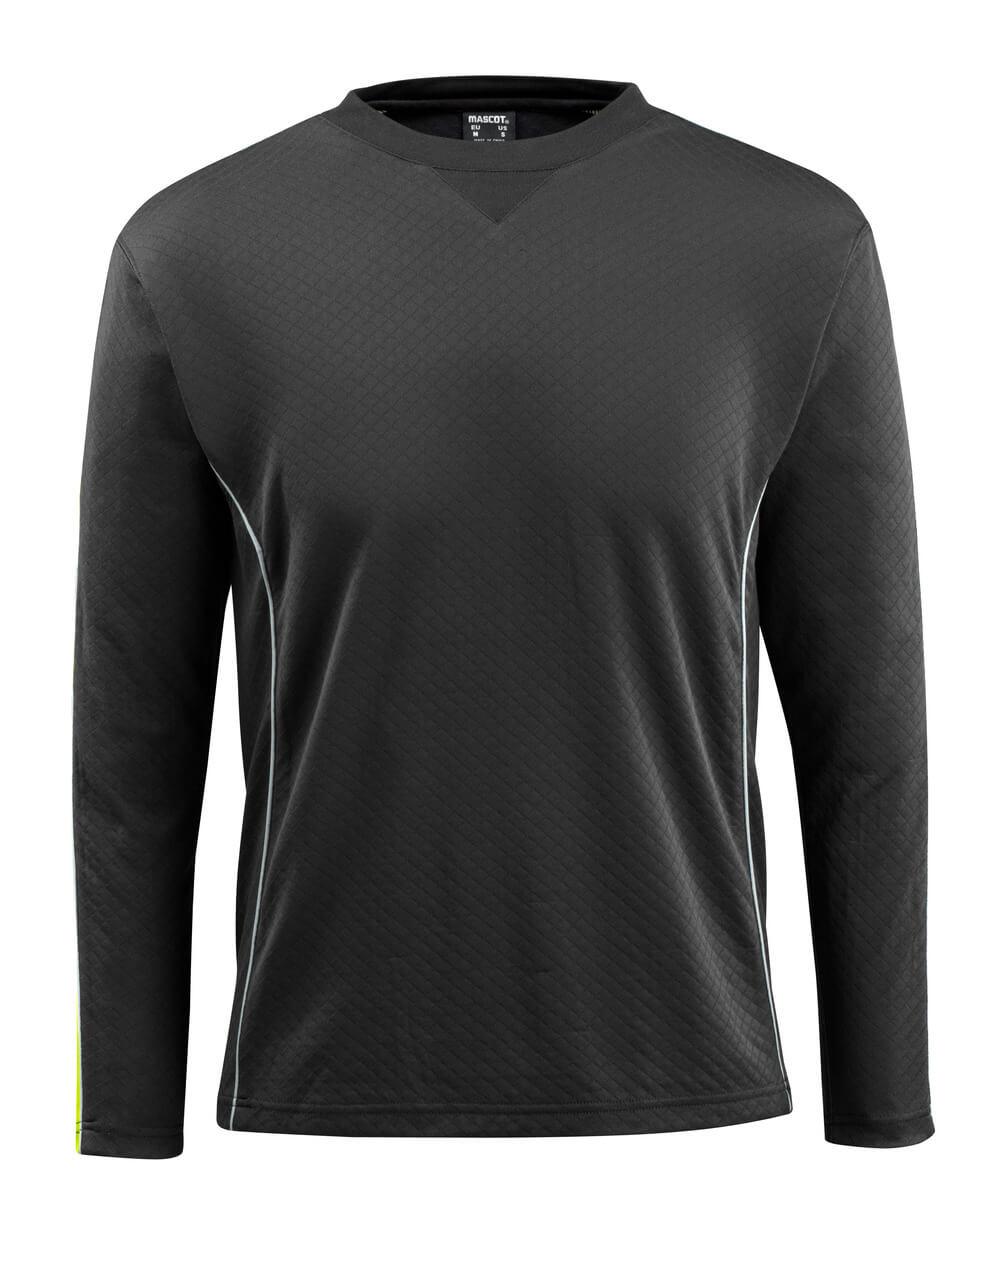 50128-933-0917 T-shirt, long-sleeved - black/hi-vis yellow